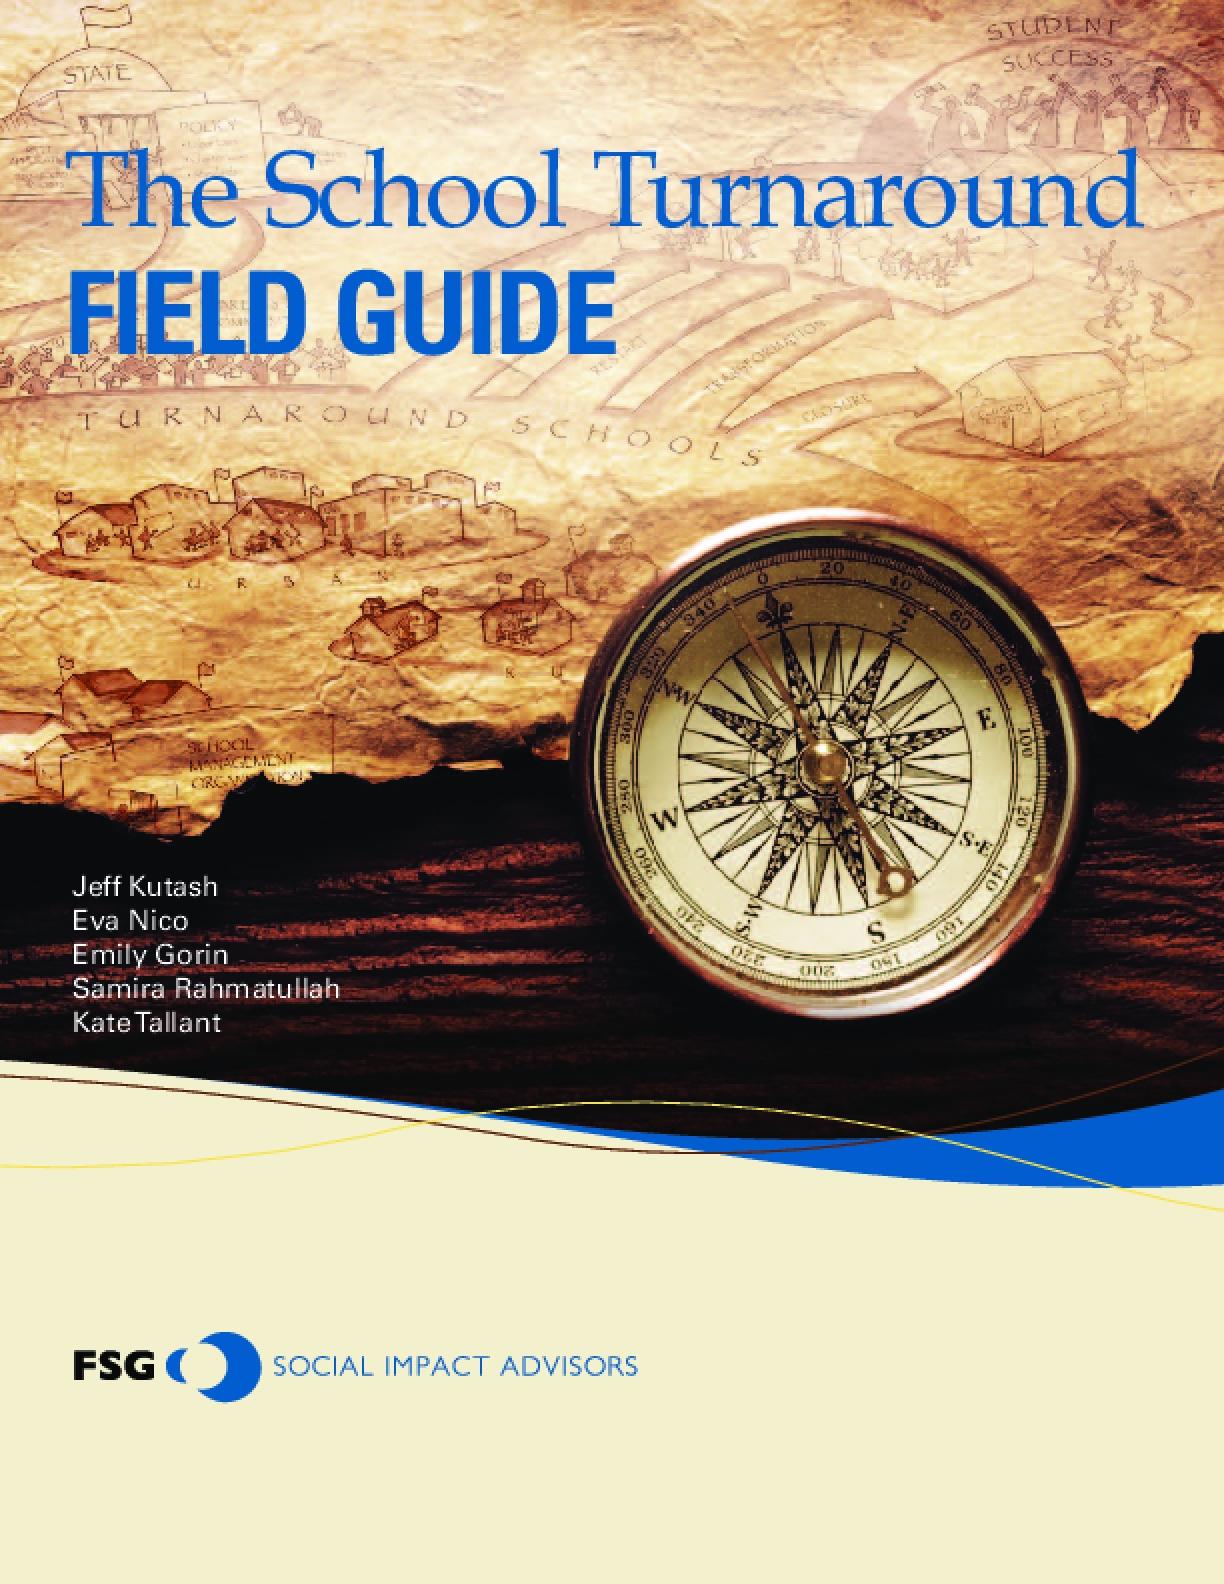 School Turnaround Field Guide